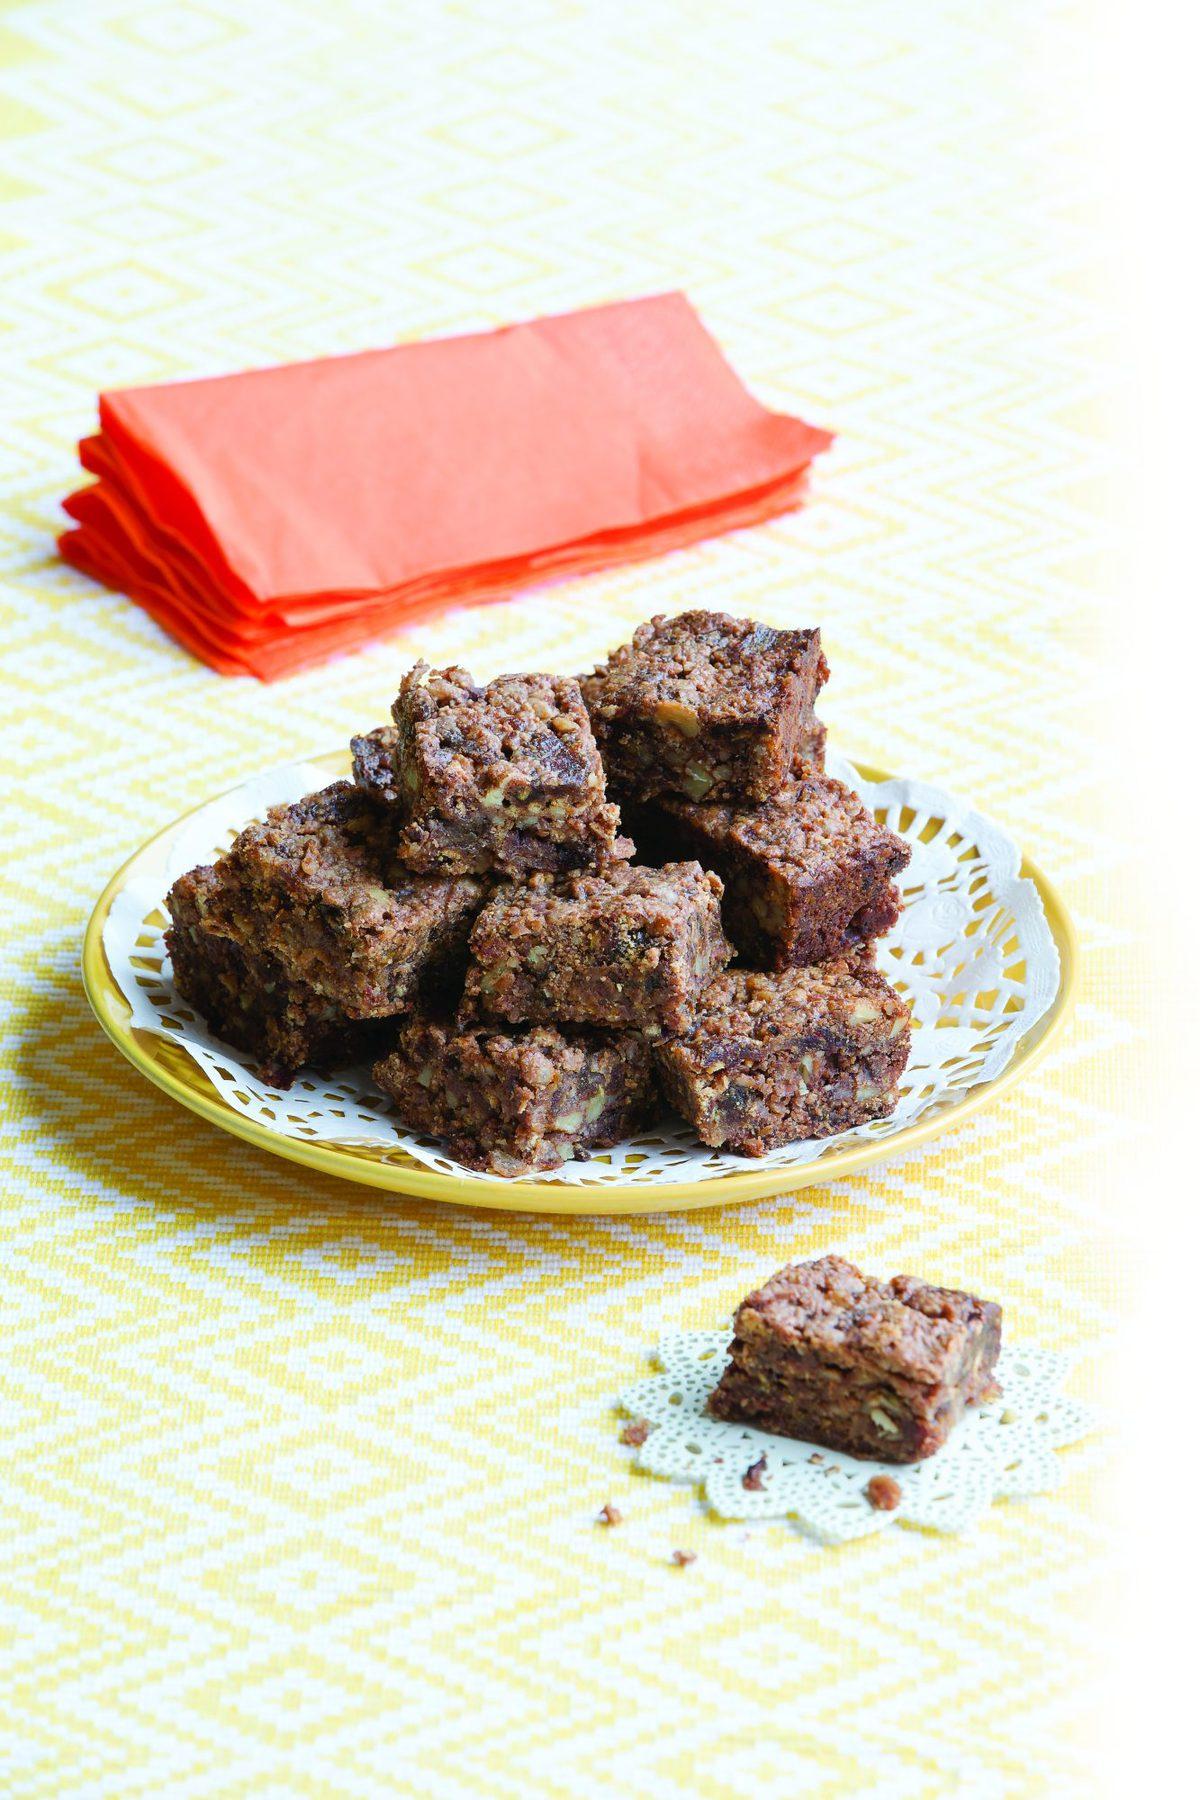 Pecan and chocolate slice